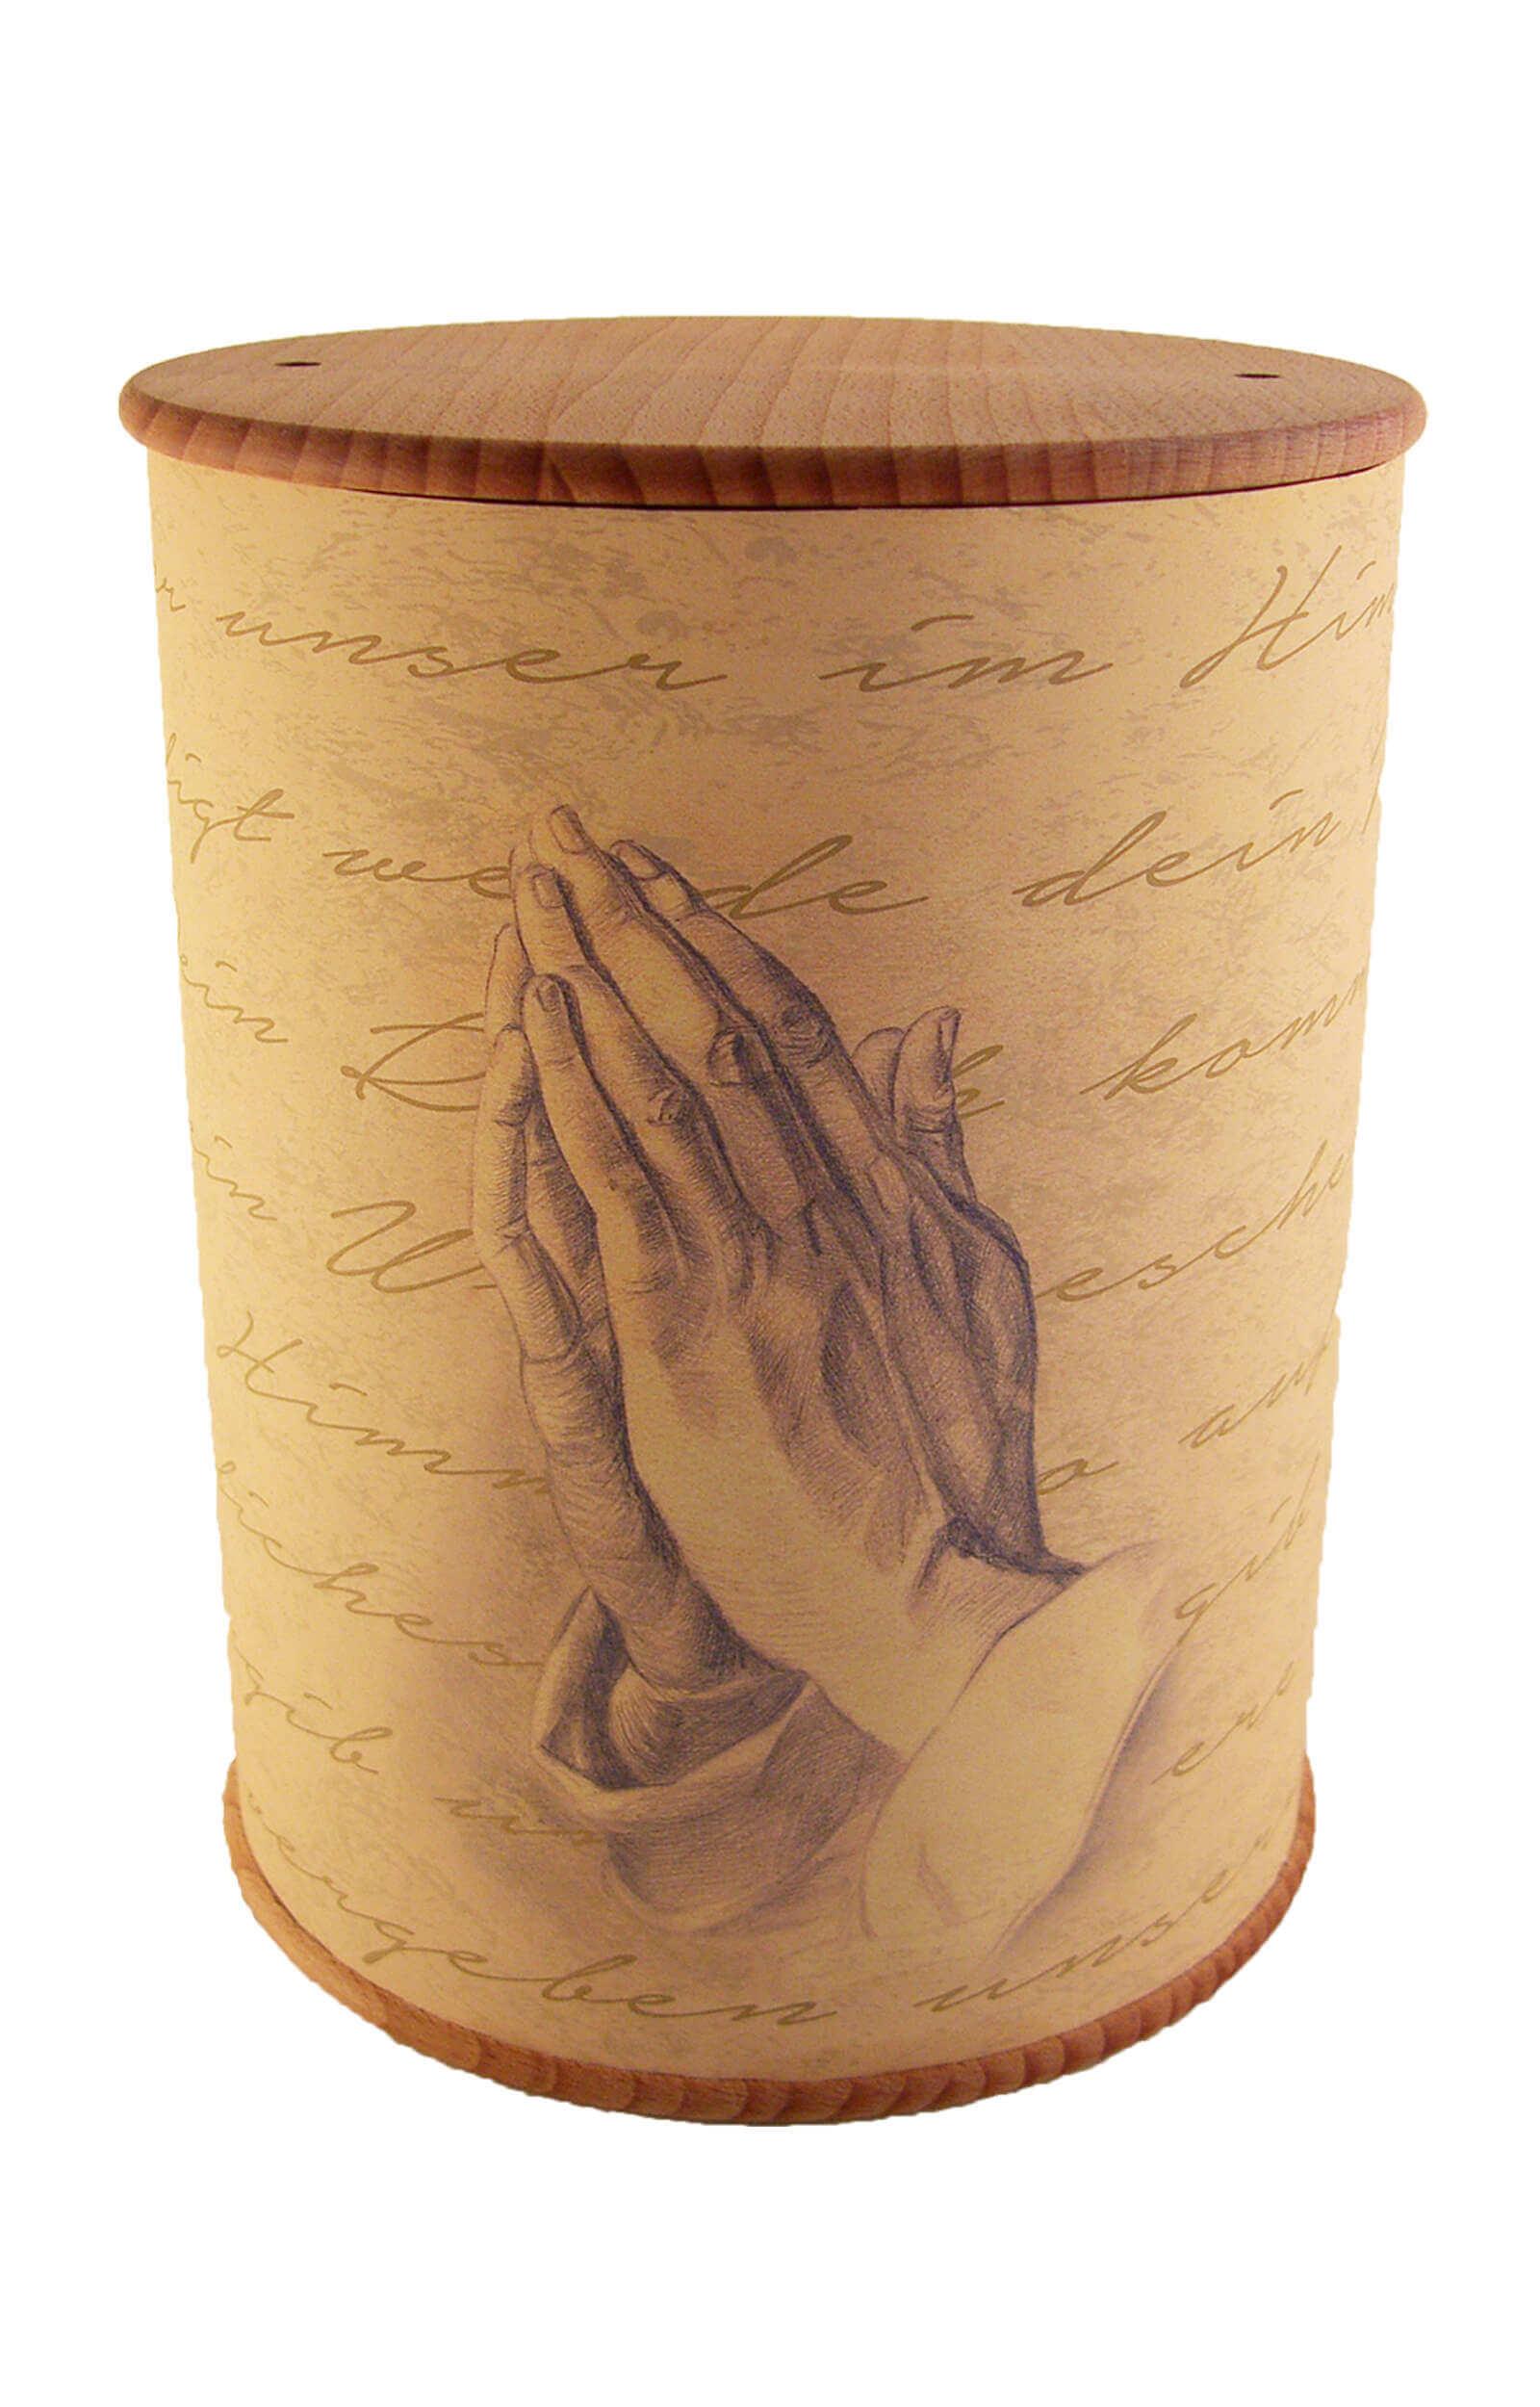 en ZB006 photo urn praying hands biodigradable funeral urns on sale